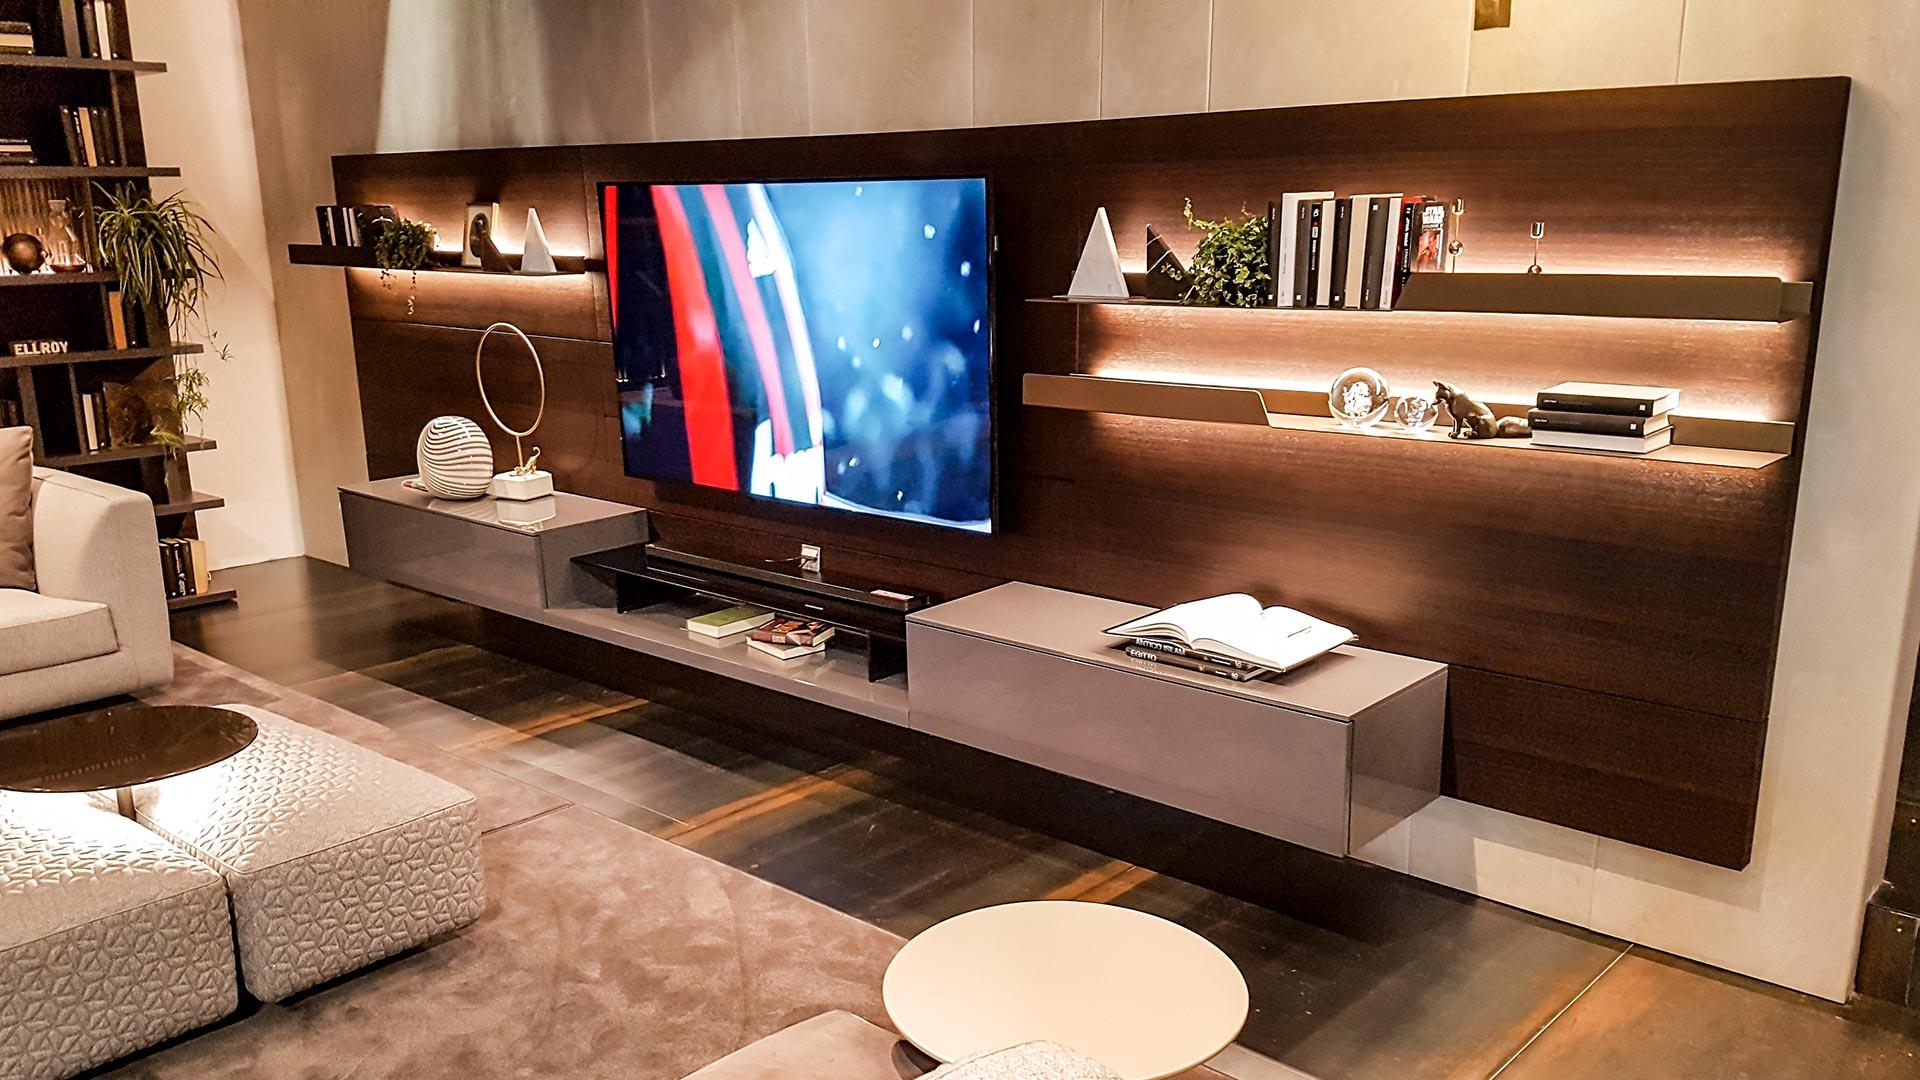 wohntrends von der m belmesse mailand 2018 teil 1 des messeberichts aktuelles hammer. Black Bedroom Furniture Sets. Home Design Ideas